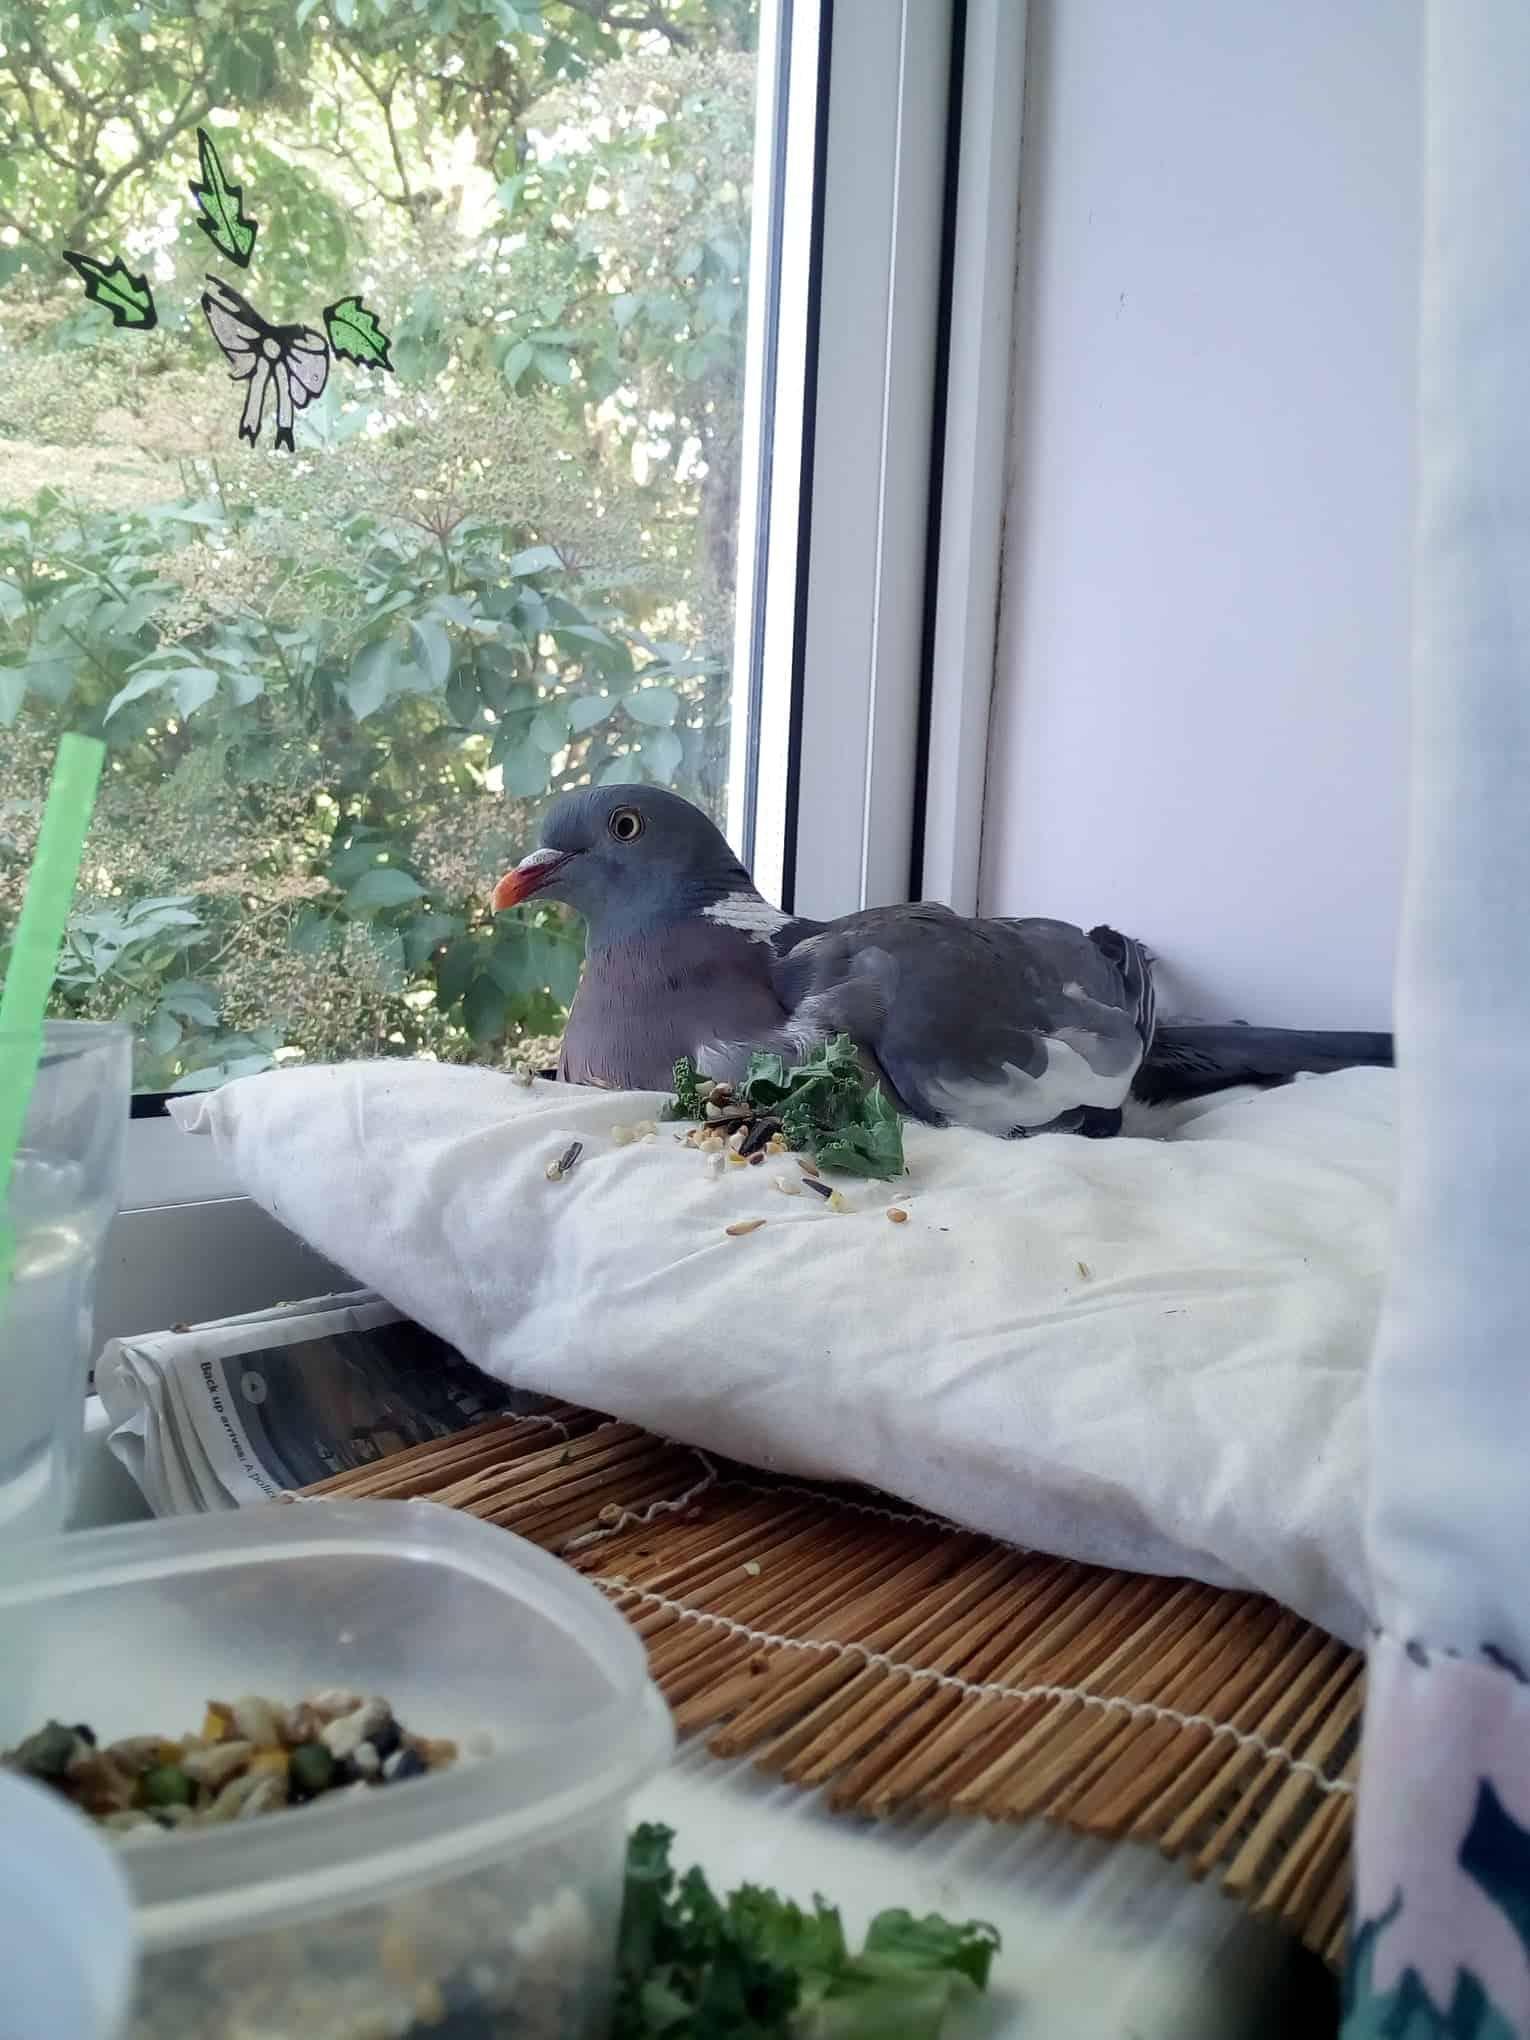 All about the Wood pigeon - GardenBird